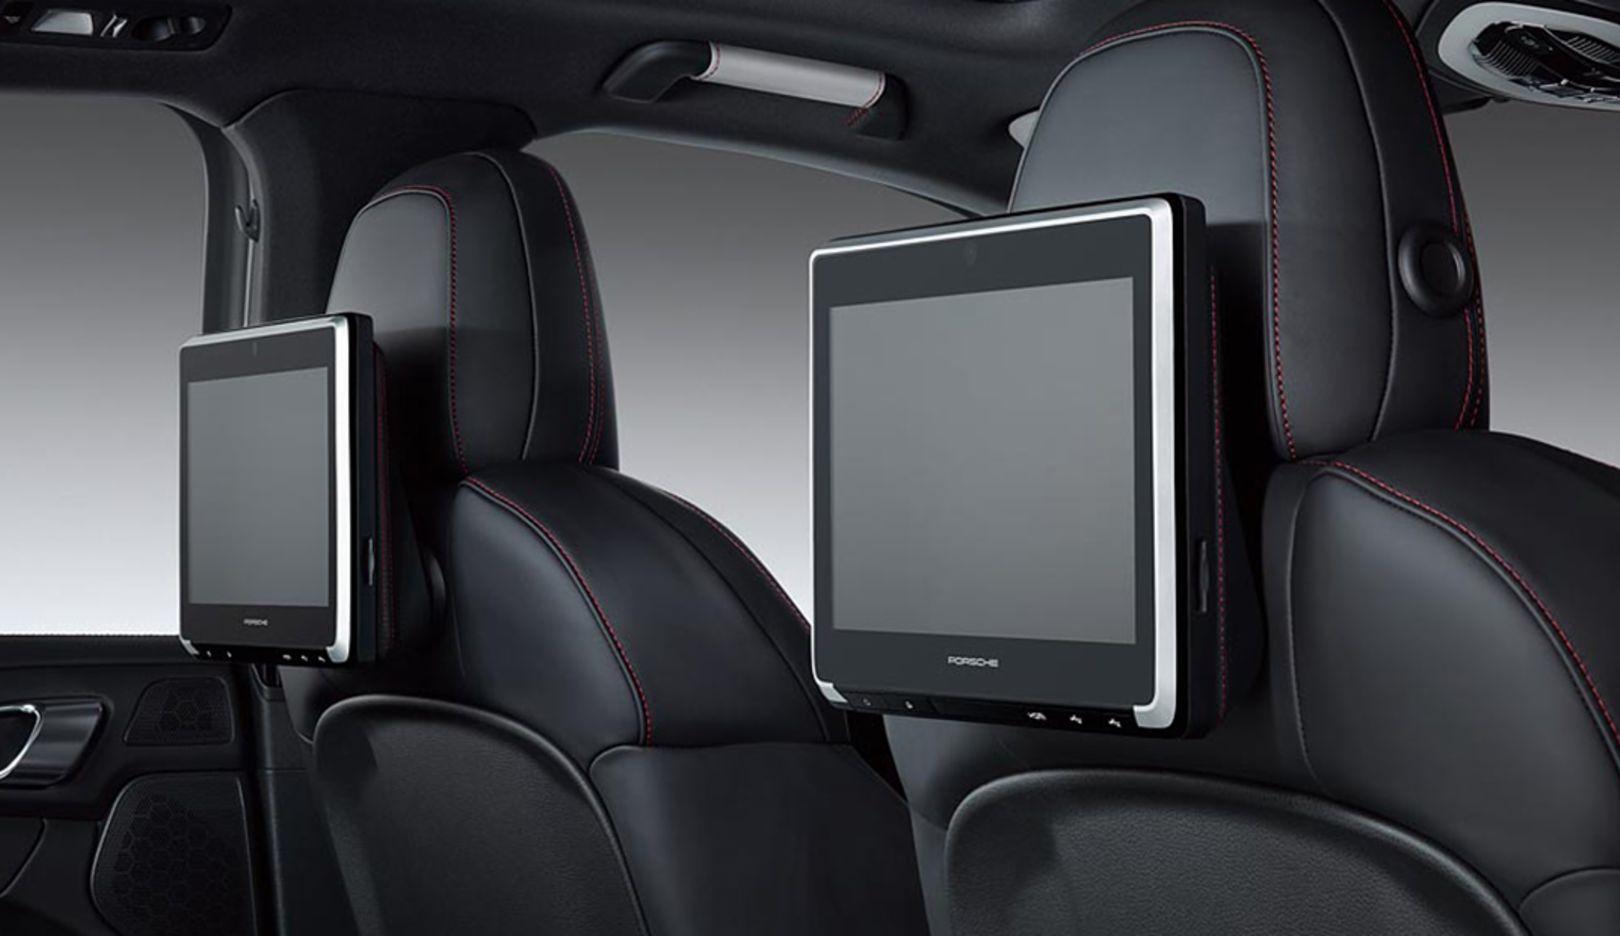 Porsche Rear Seat Entertainment for Cayenne, Macan and Panamera, 2015, Porsche AG